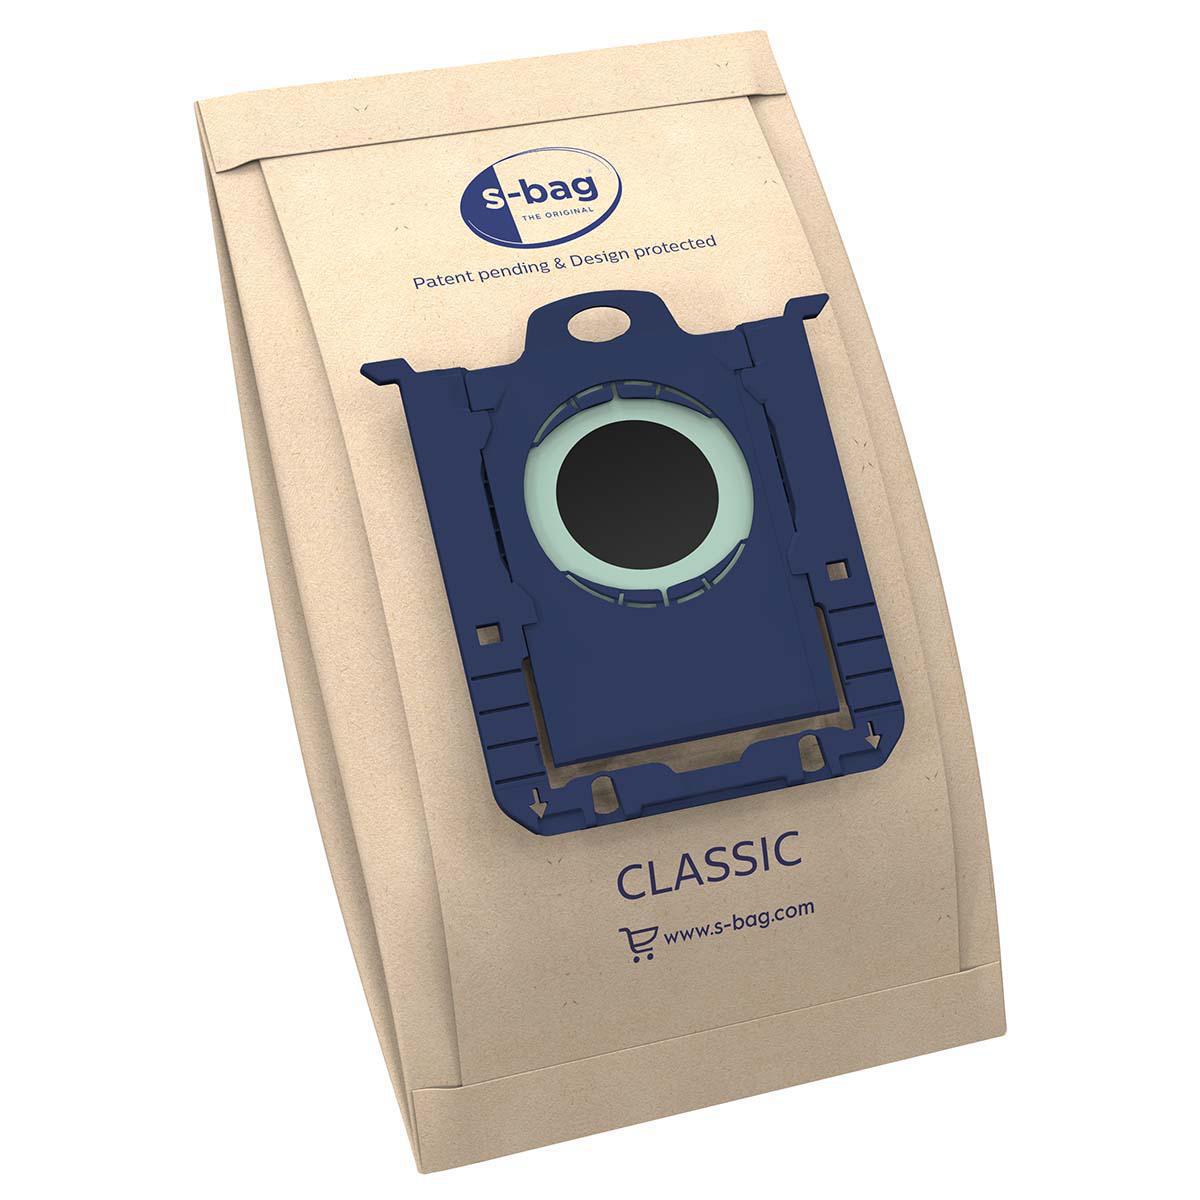 E200 15 x E15 E18 E40 E200B Vacuum Bags for Philips Specialist Control Sydne